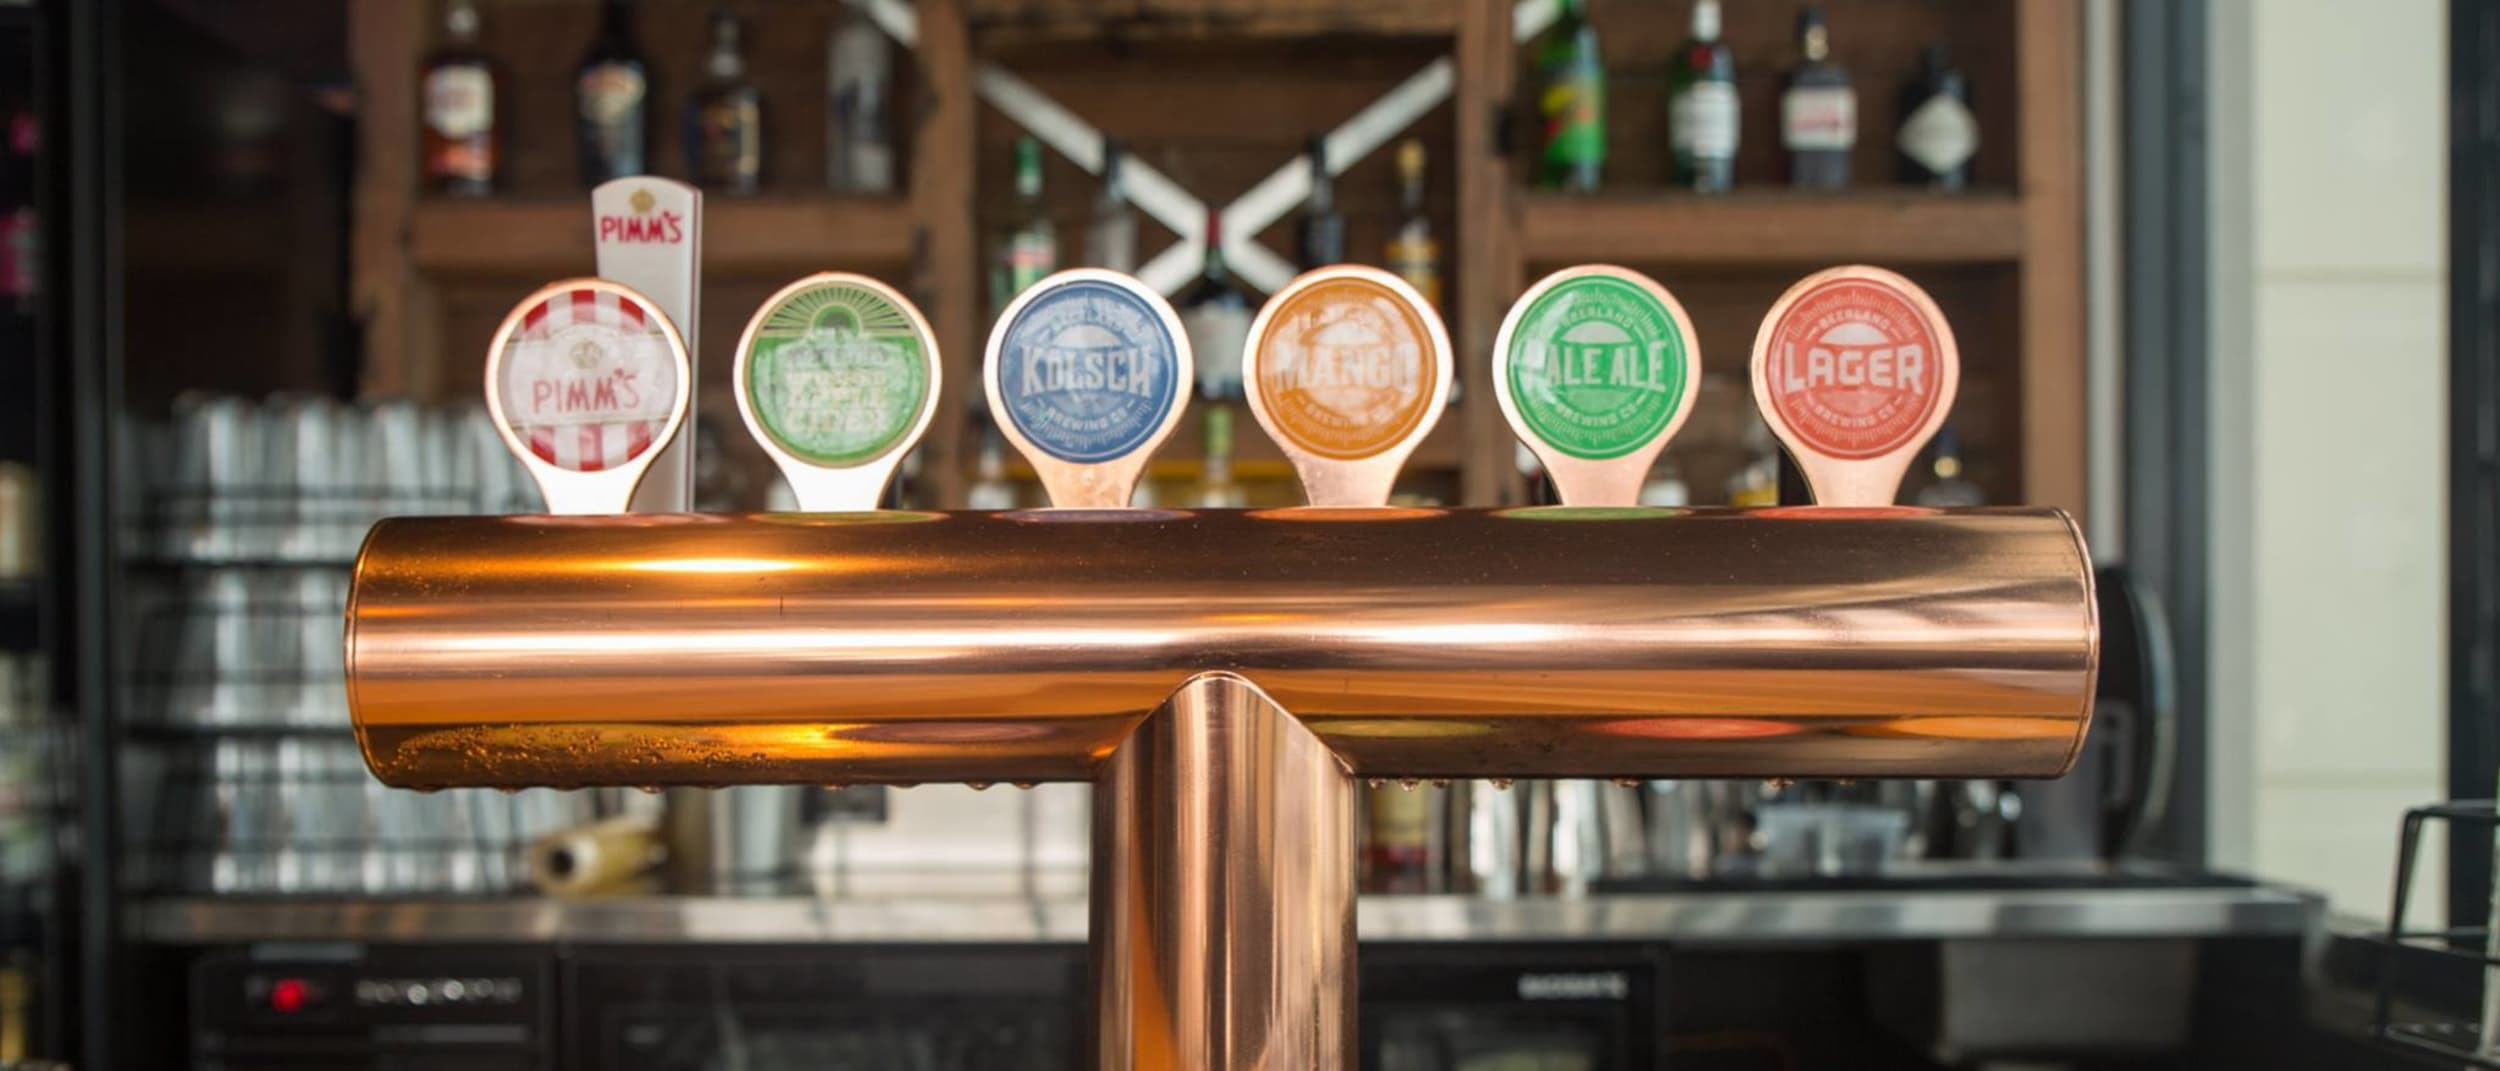 Whitfords Brewing Co: Beer degustation